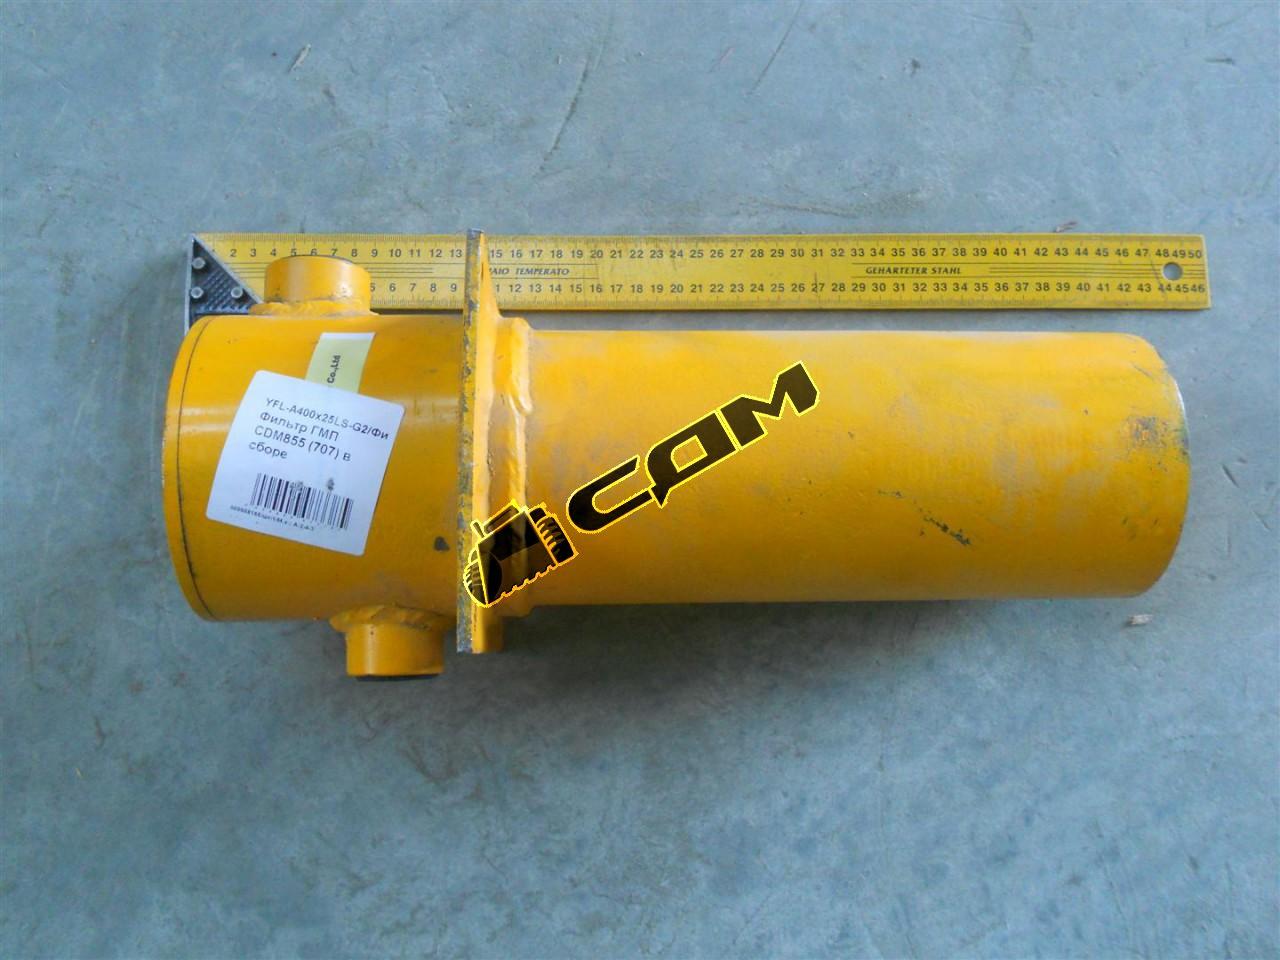 Фильтр ГМП в сборе CDM855 YFL-A400x25LS-G2